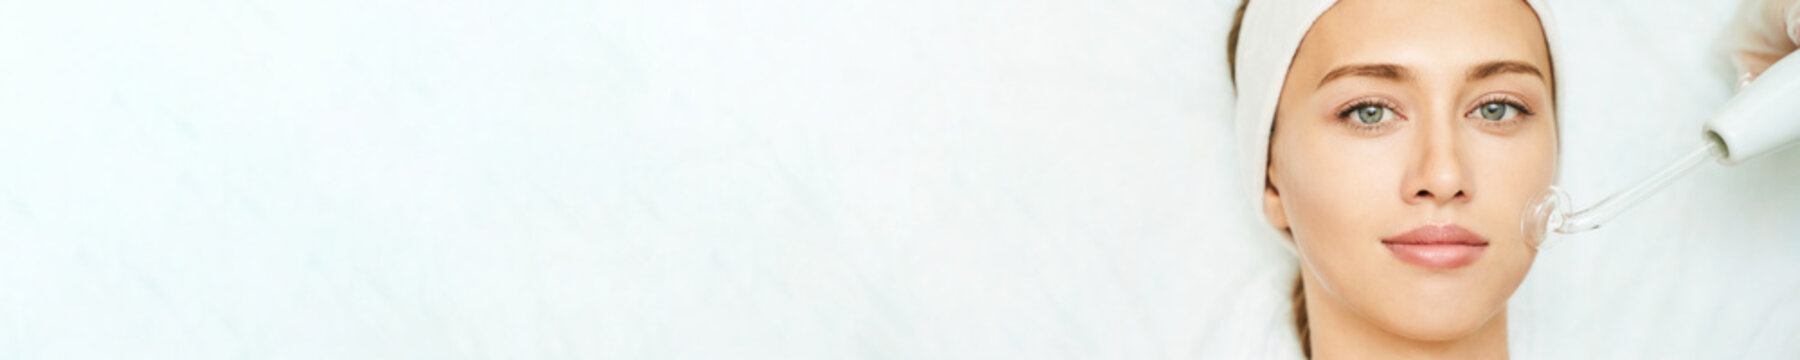 Darsonval cosmetology apparatus. Face clean procedure. Salon treatment. Professional dermatology hardware. Electric equipment. Medicine device. Removal acne. Dermatology. Detox therapy. Rejuvenation